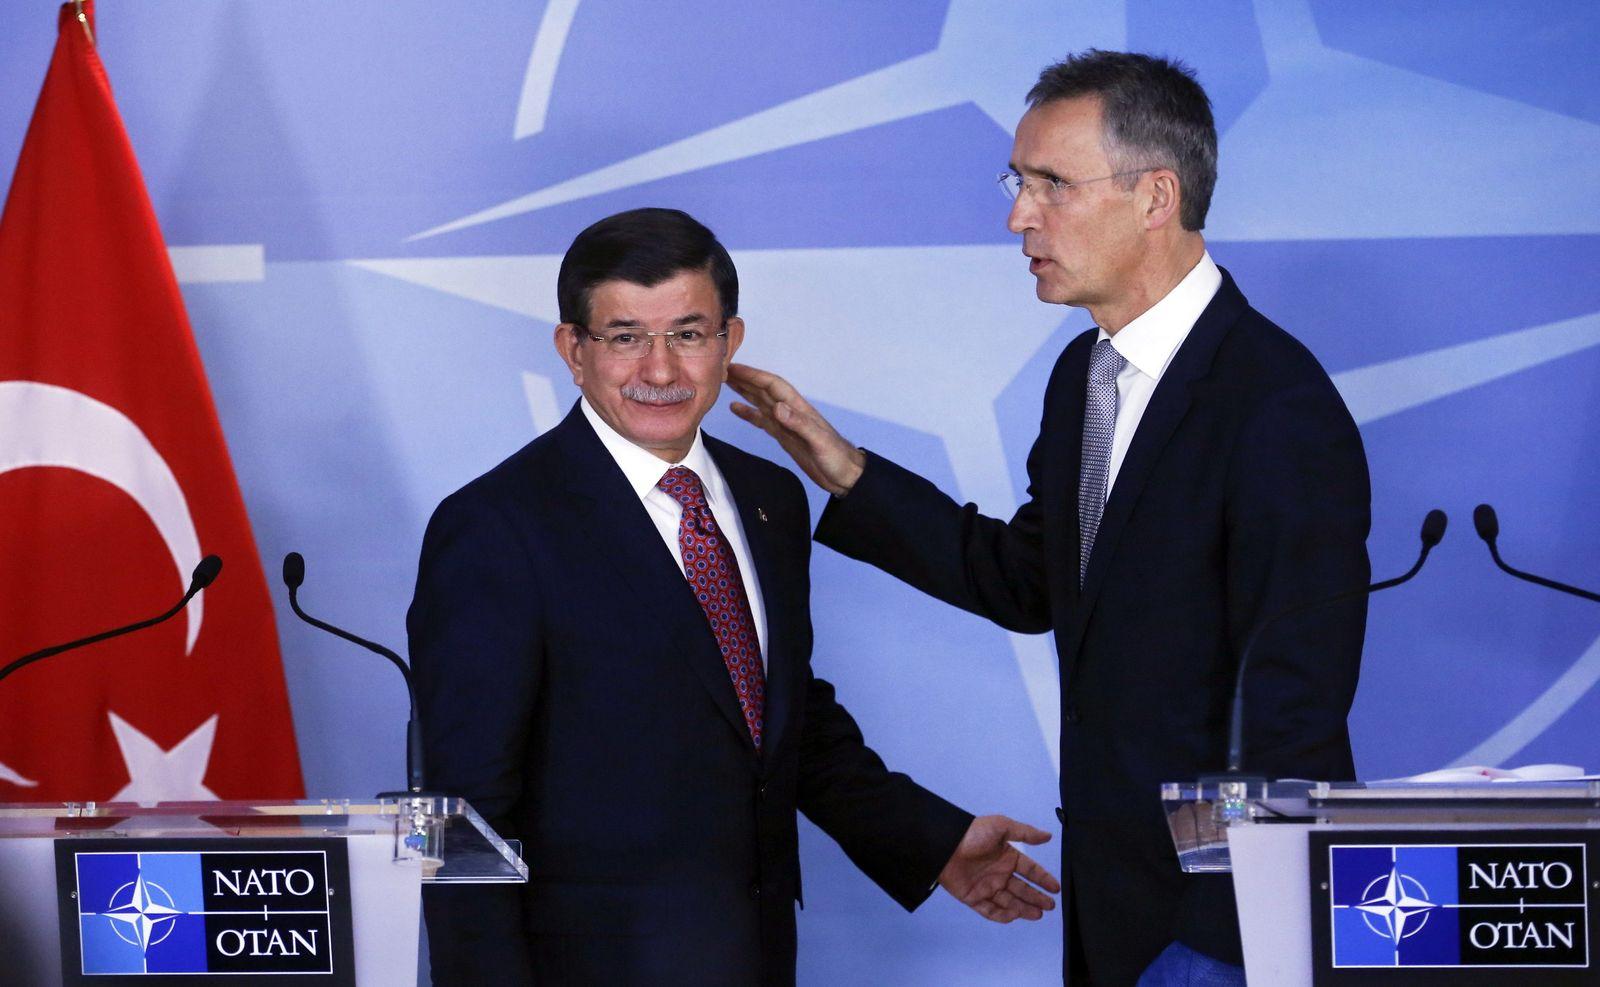 NATO Turkey meeting